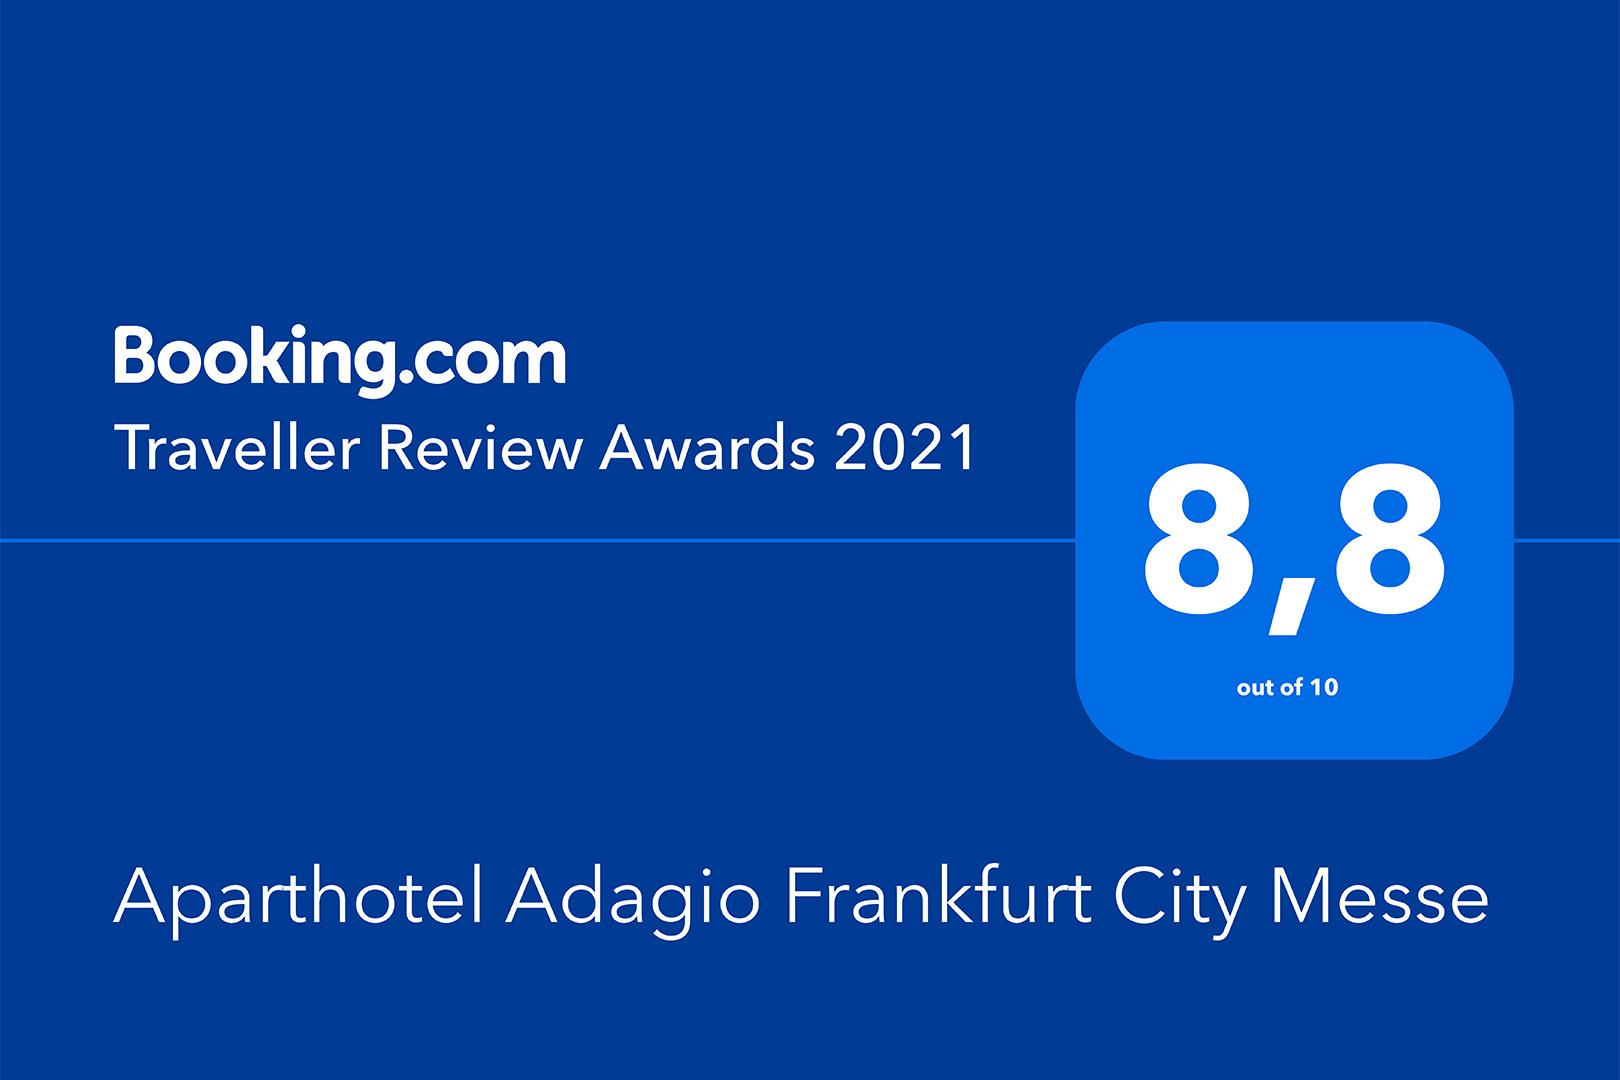 Aparthotel Adagio Frankfurt City Messe - Traveller Review Award 2021